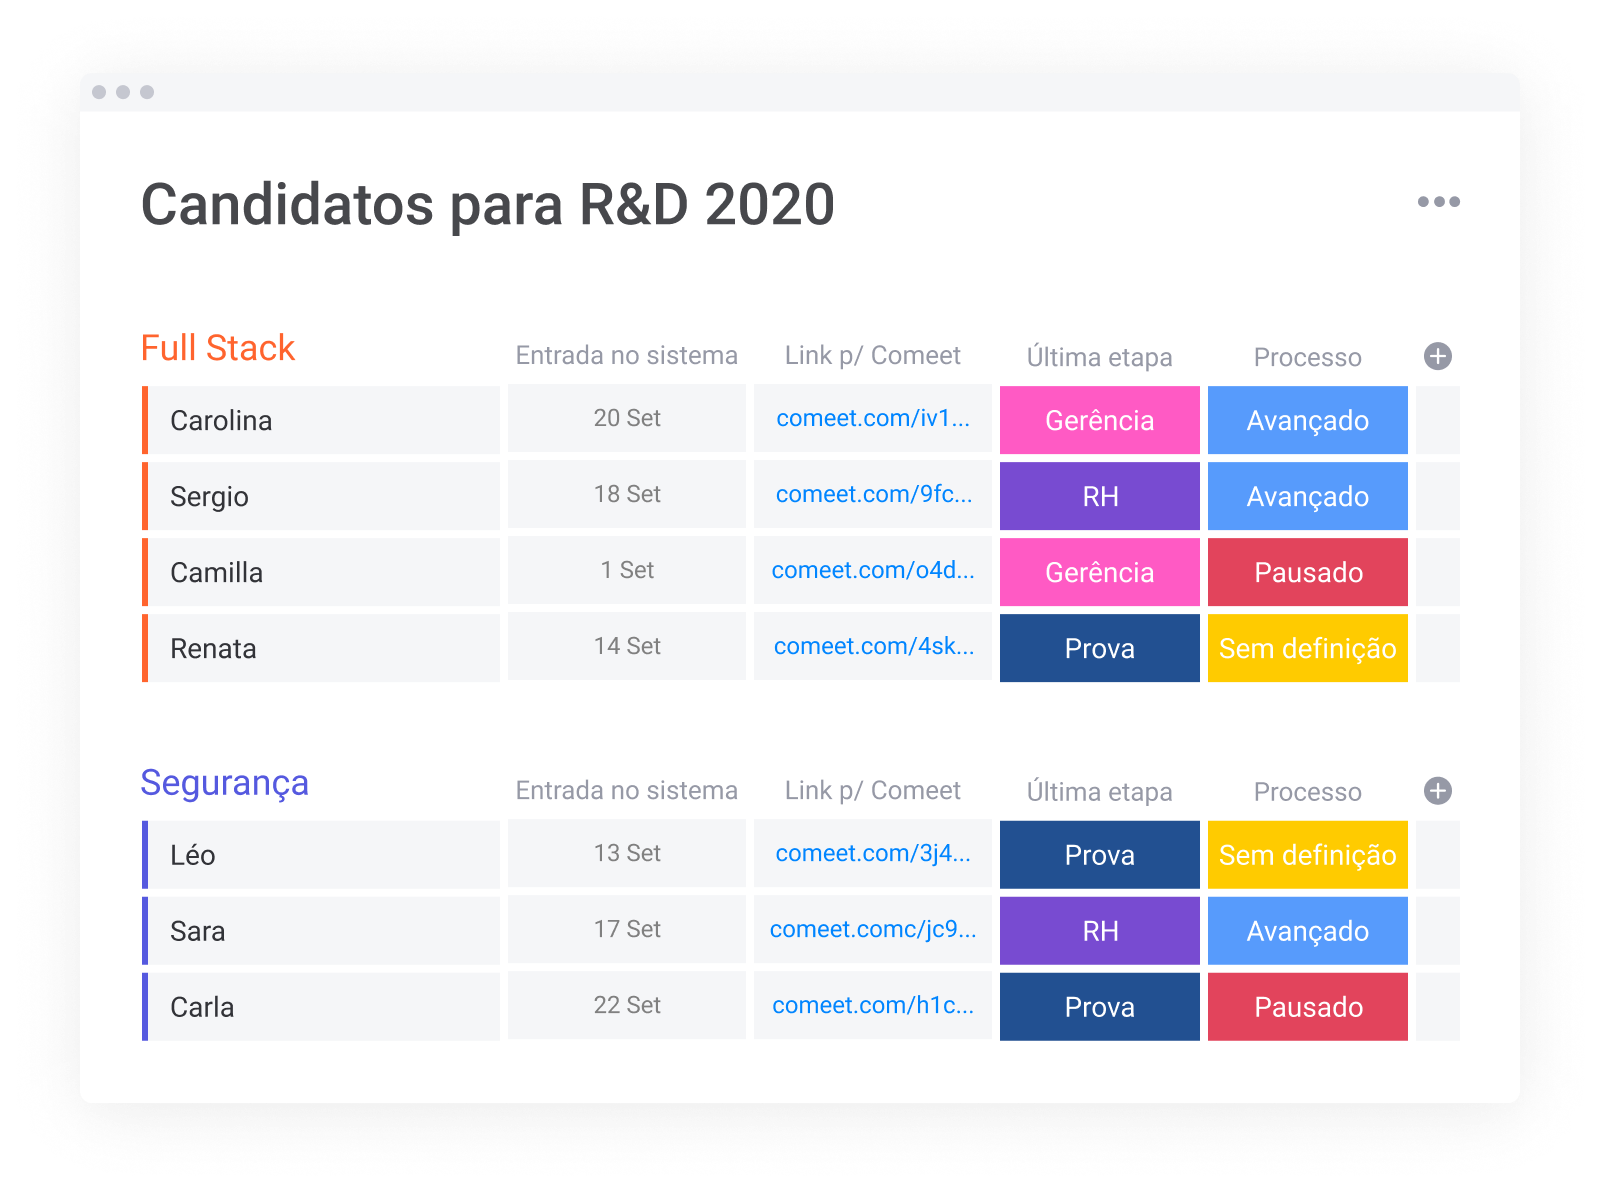 Template de Candidatos 2020